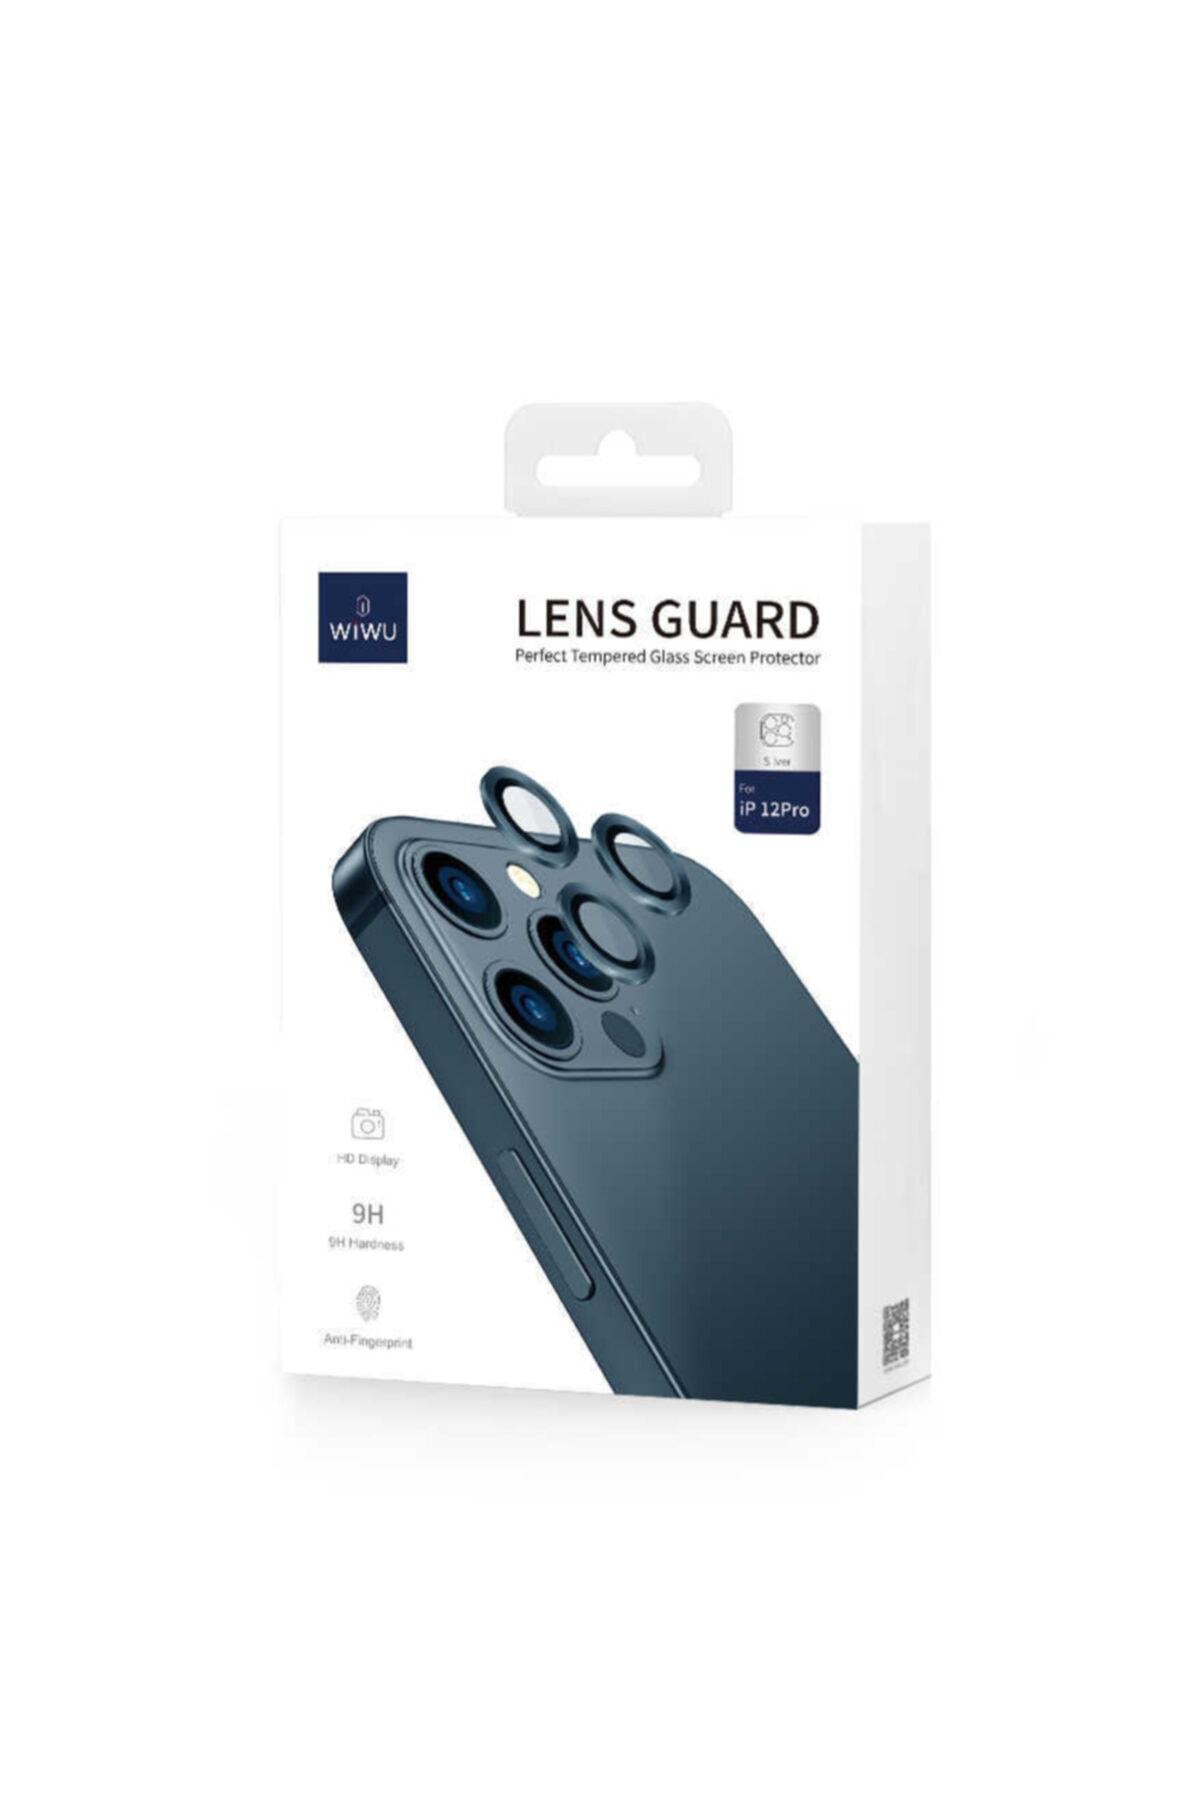 Cep prime Iphone 12 Pro Uyumlu Max ???4 Katmanlı Metal Nano Sistem Tam Koruma Sistem Lens Gold